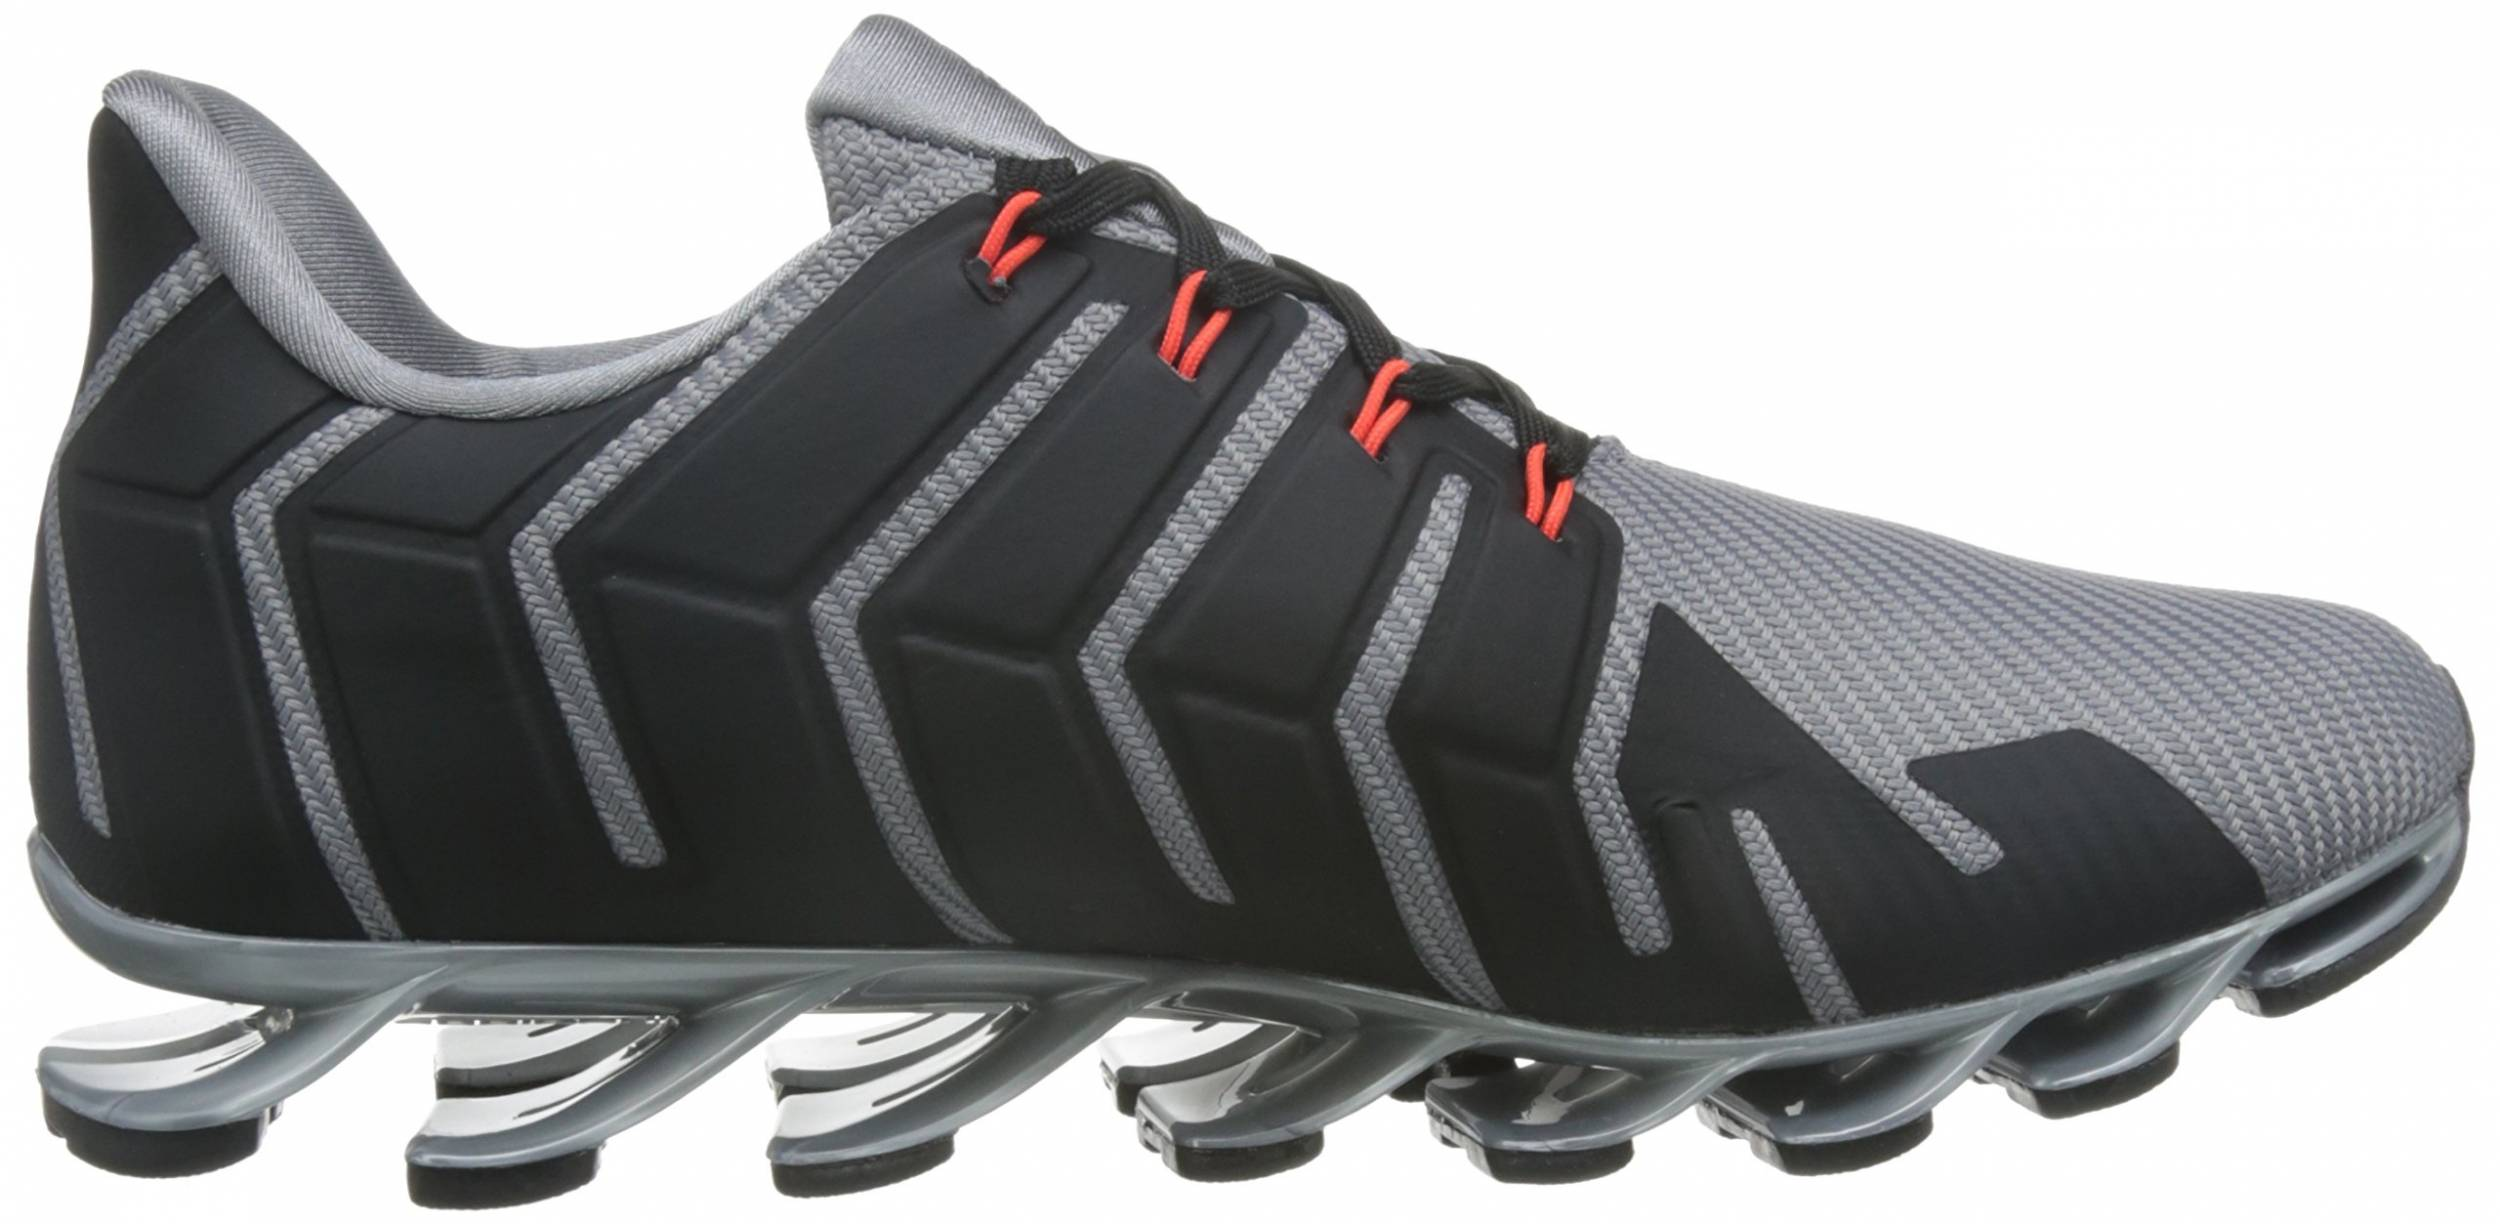 $180 + Review of Adidas Springblade Pro